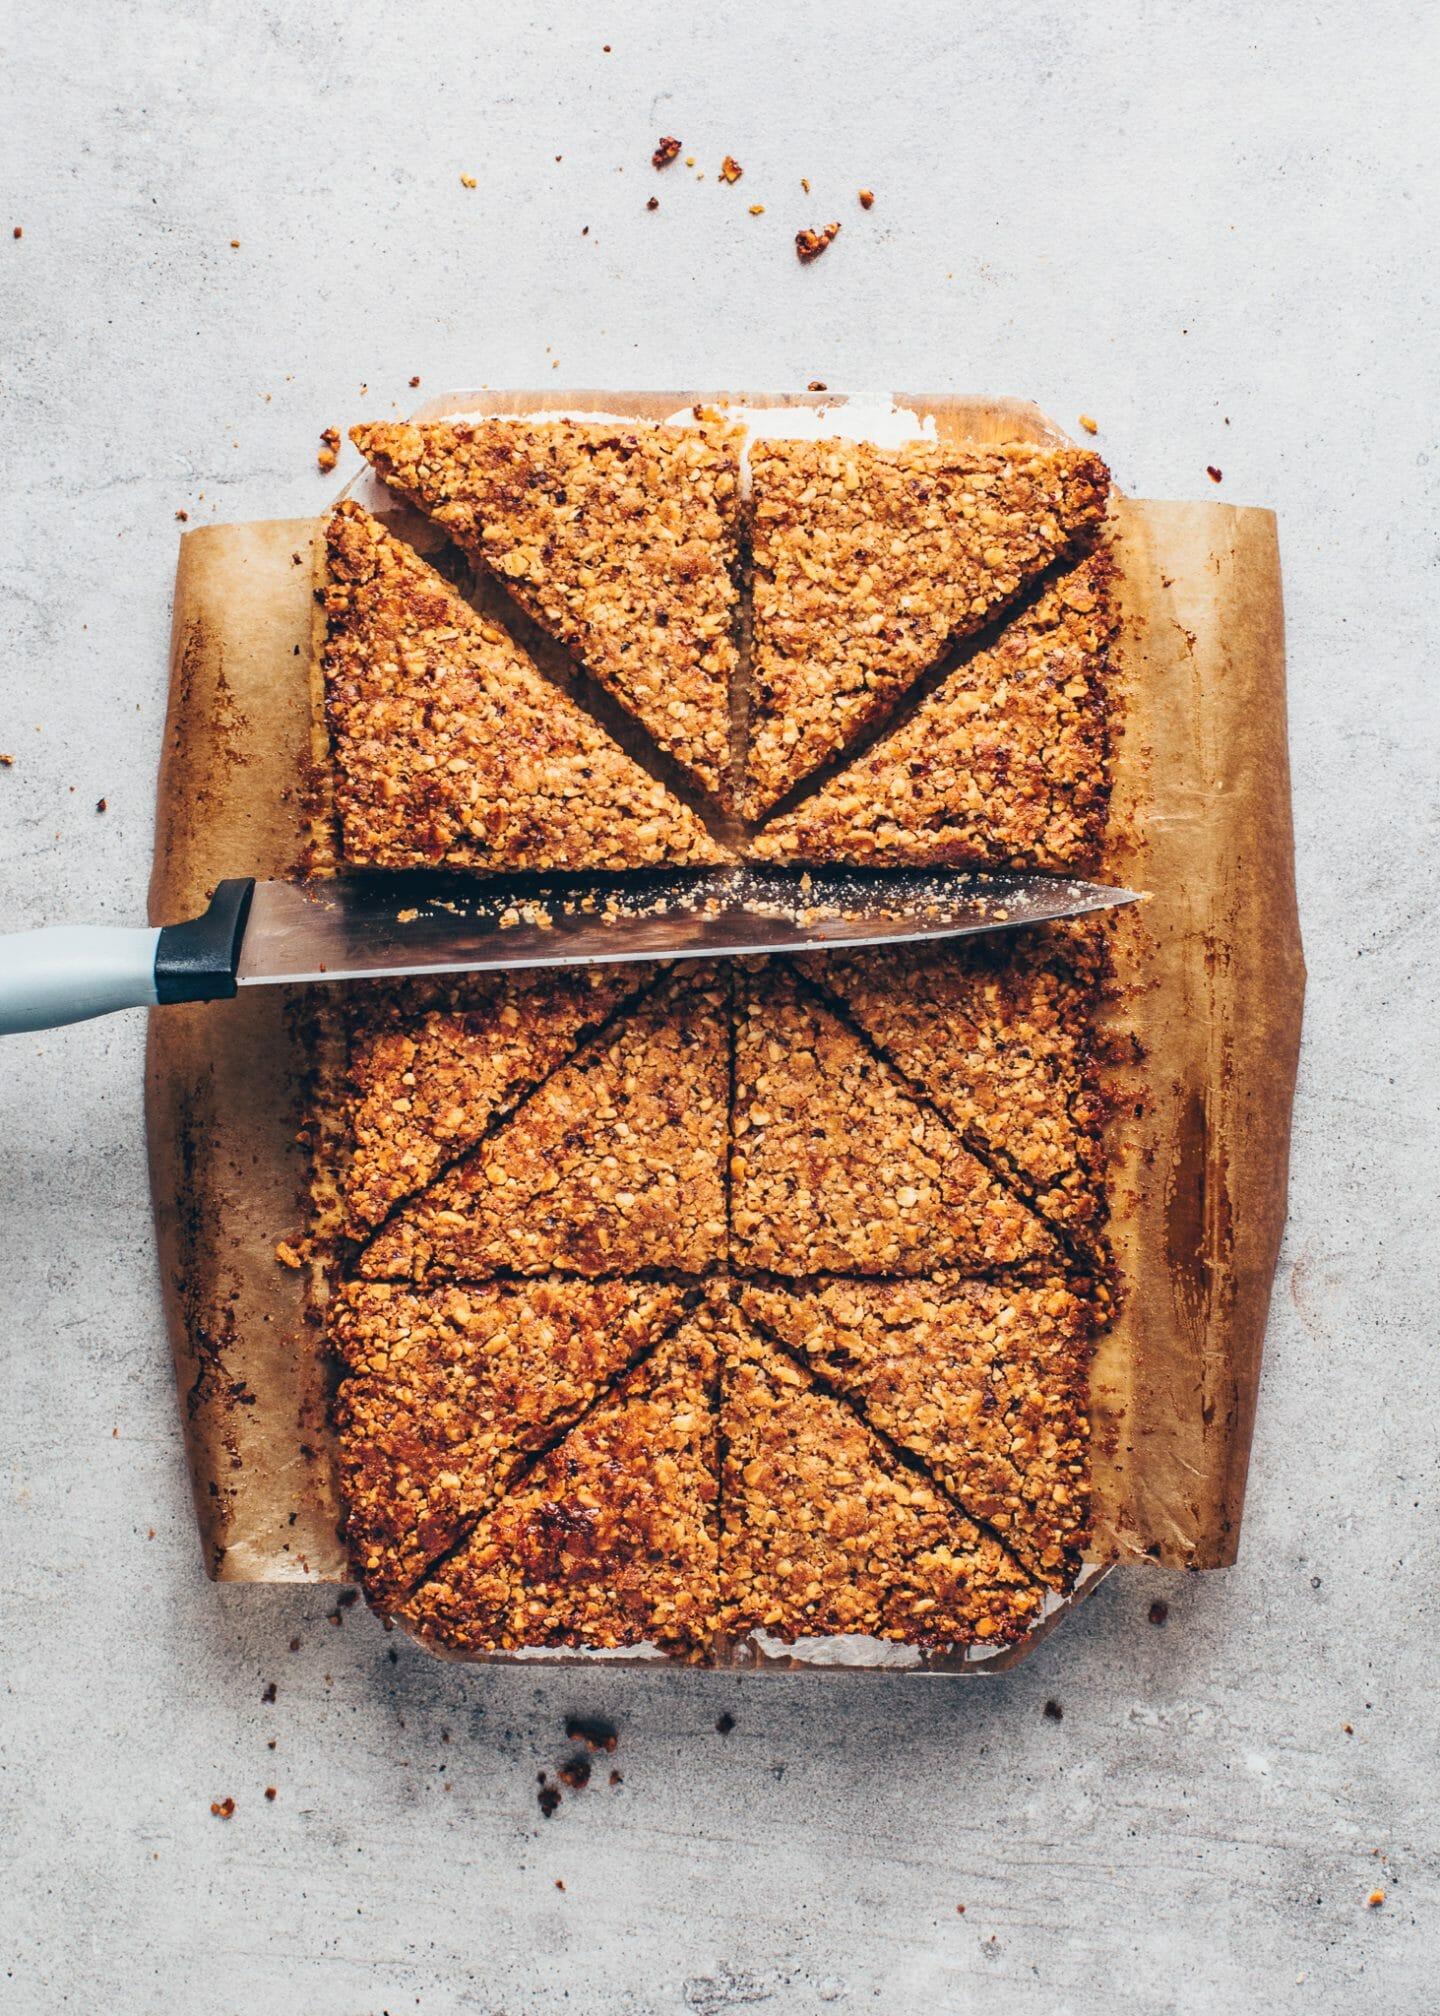 nut bars (hazelnut cookie corners)